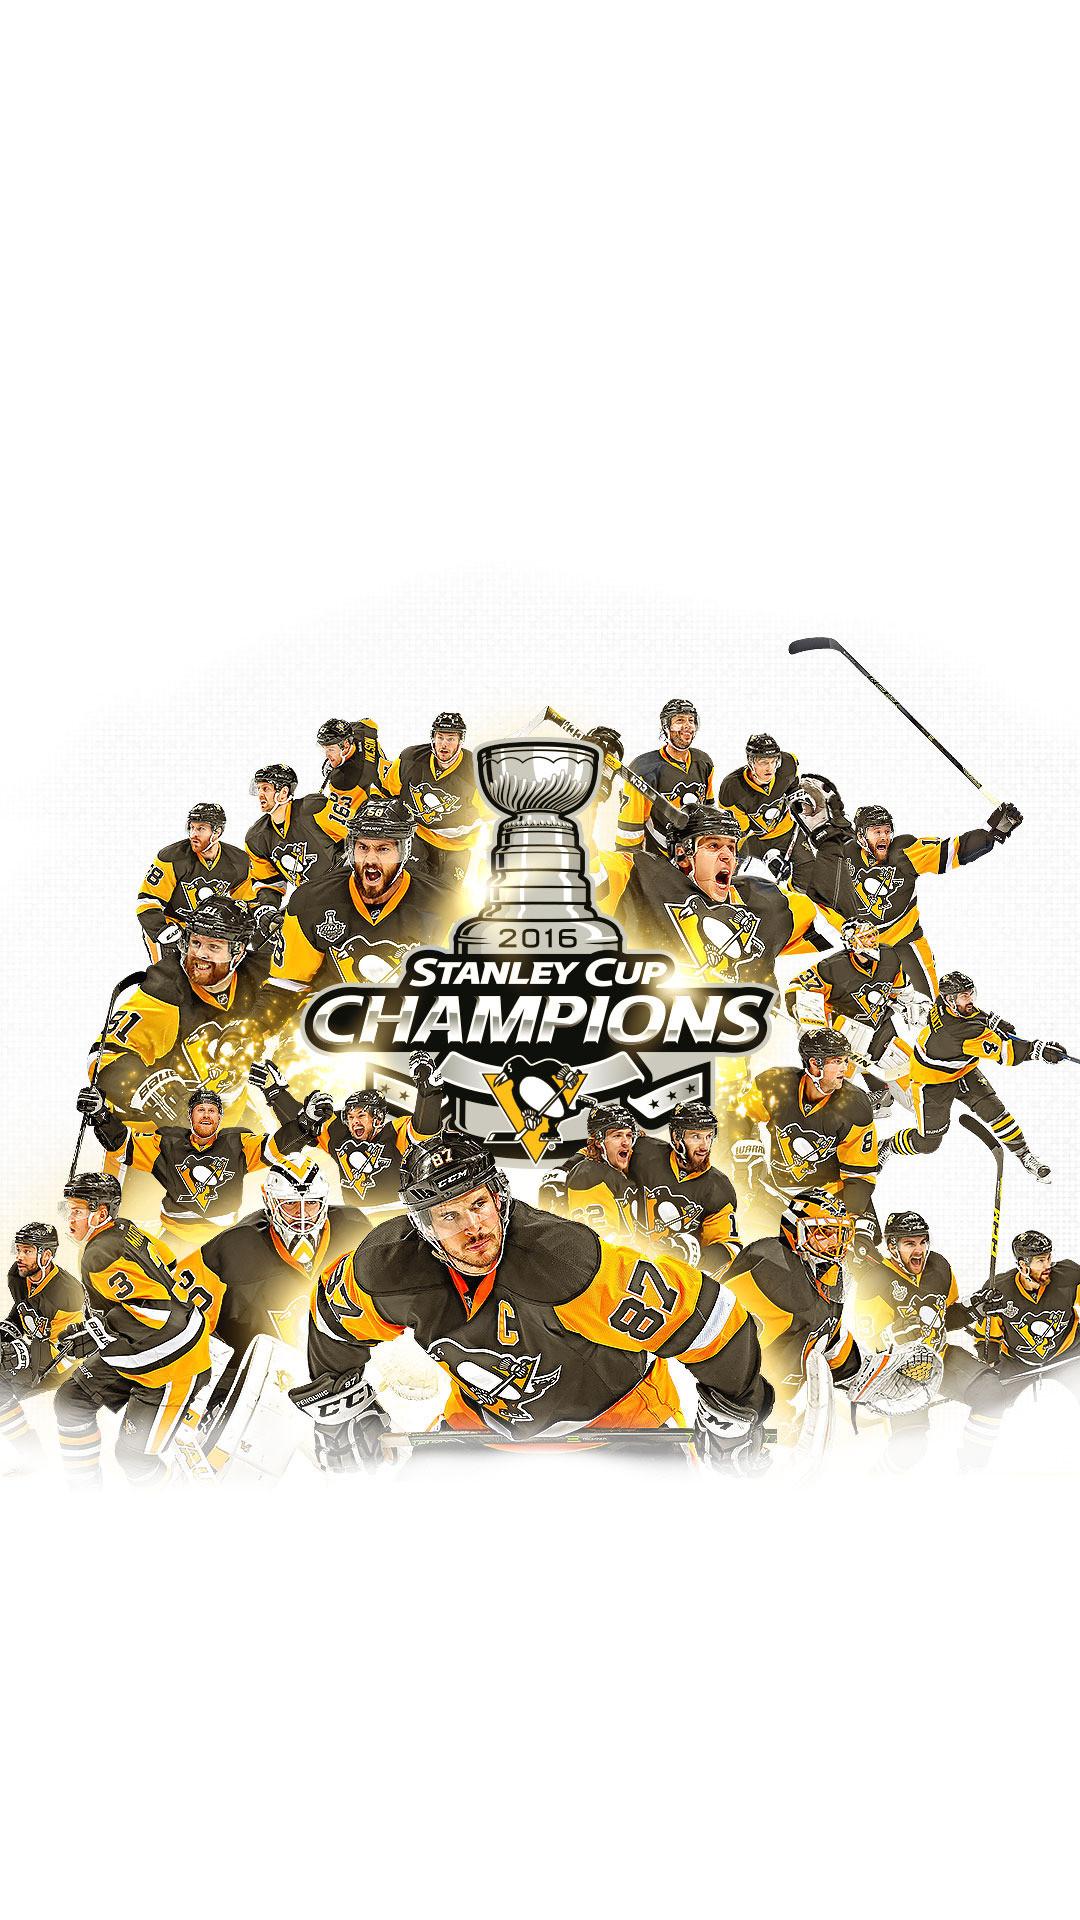 Pittsburgh Penguins Backgrounds Wallpaper   HD Wallpapers   Pinterest    Wallpaper